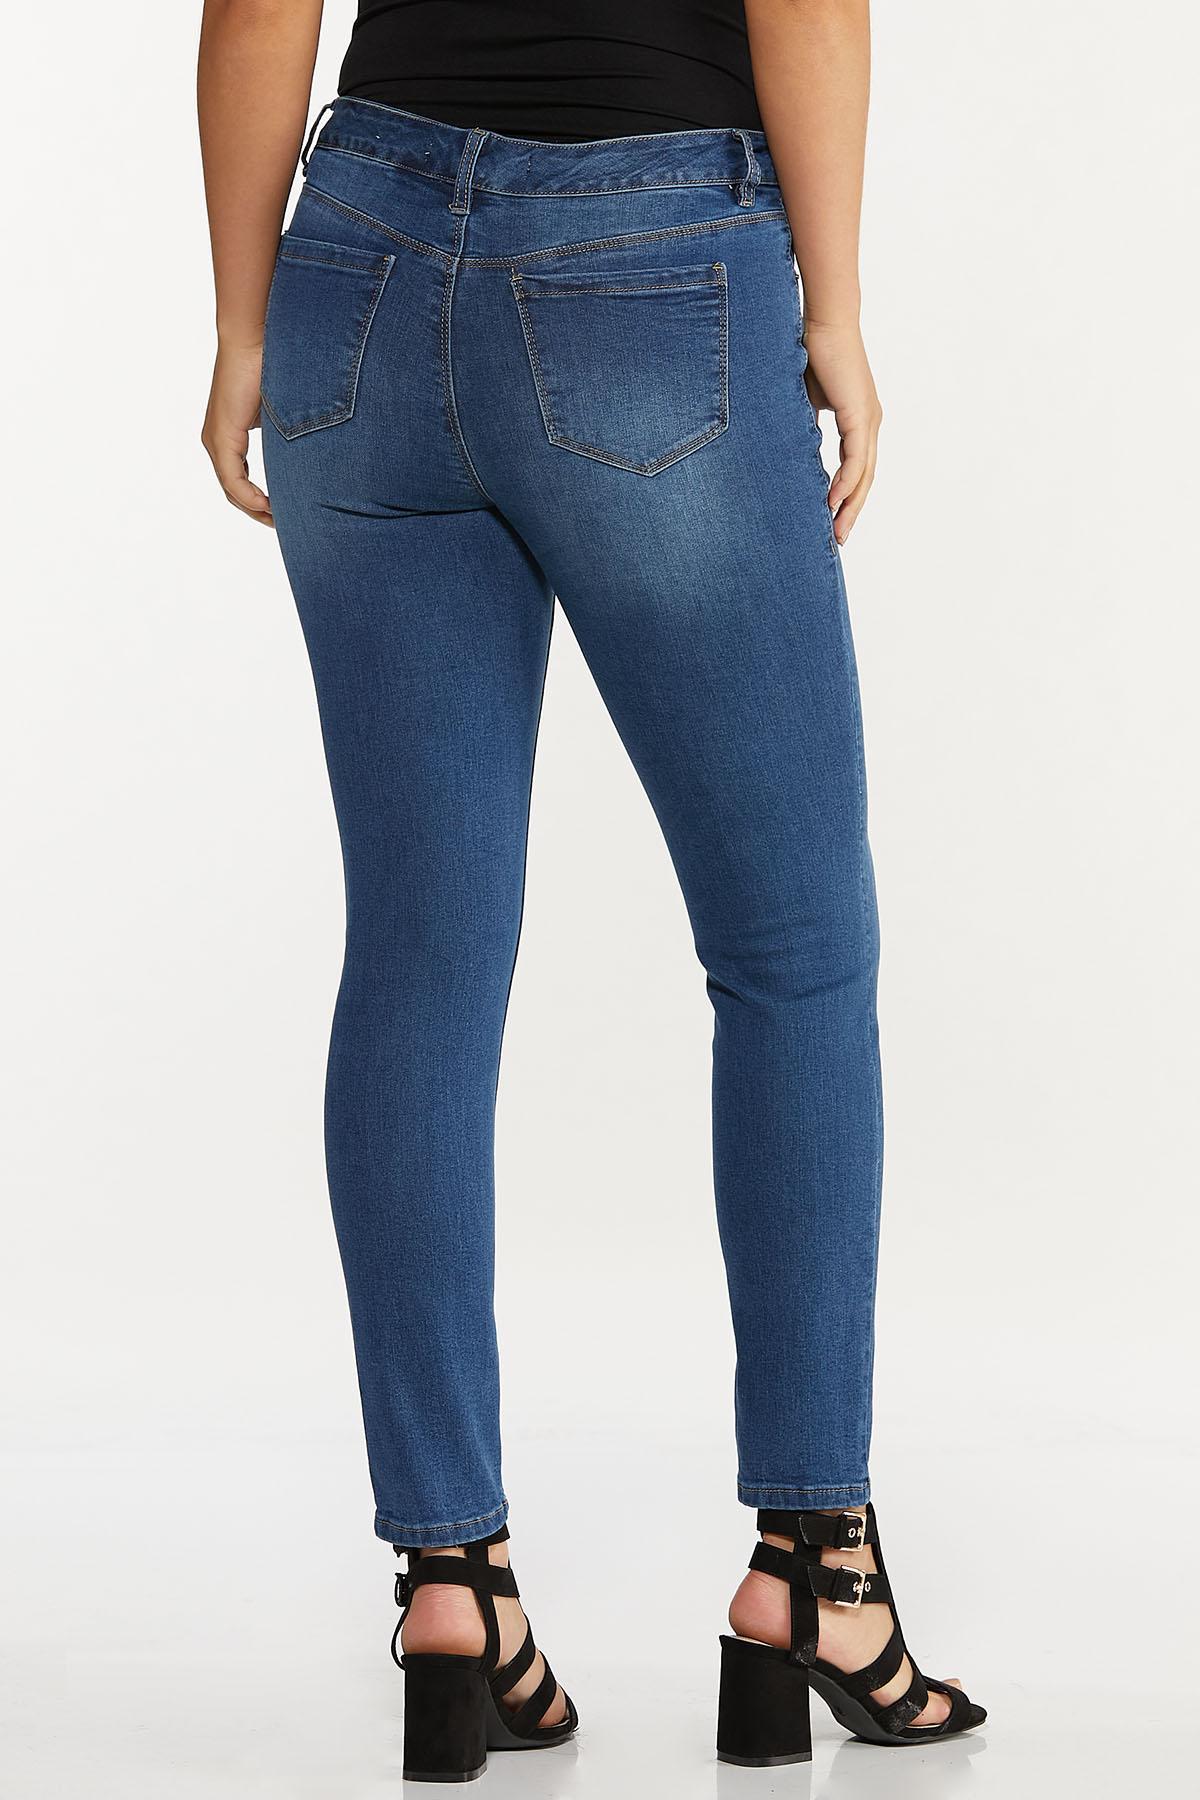 High-Rise Medium Wash Skinny Jeans (Item #44606532)